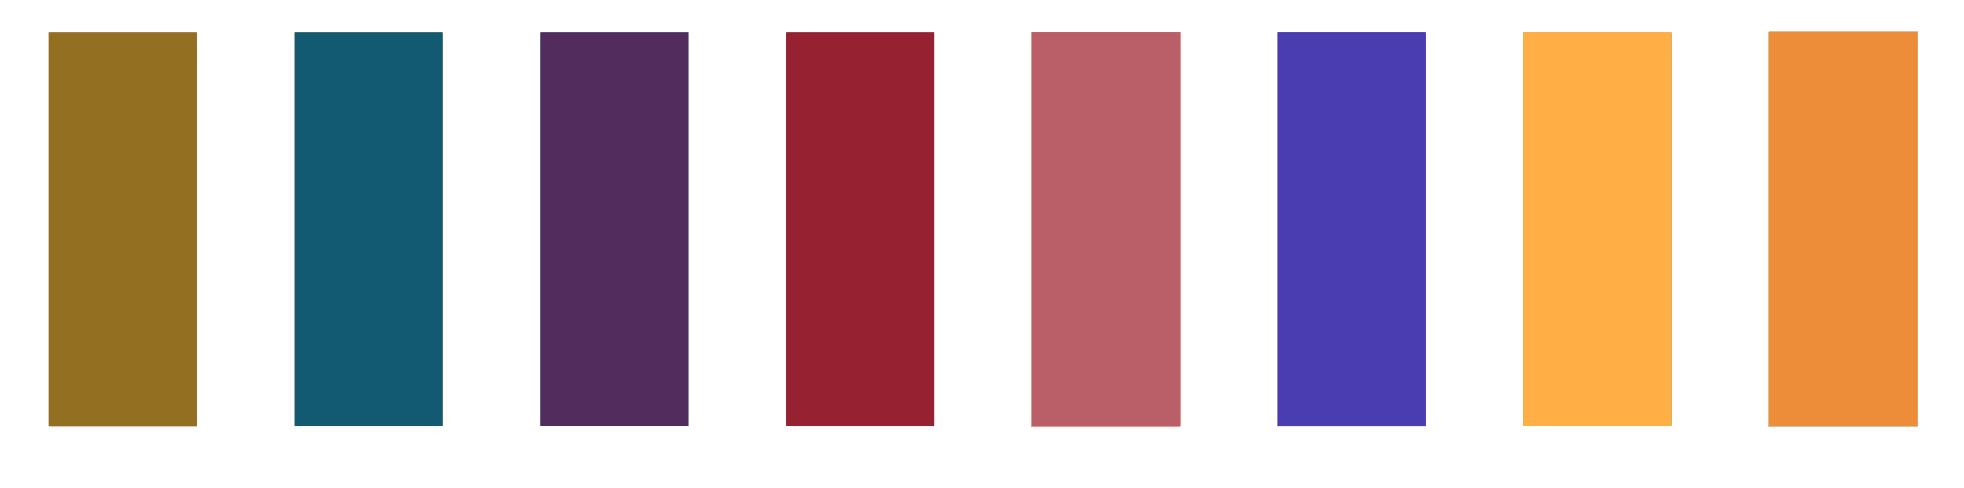 color palette u2013 7 nidhi saxena u0027s blog about patterns colors and